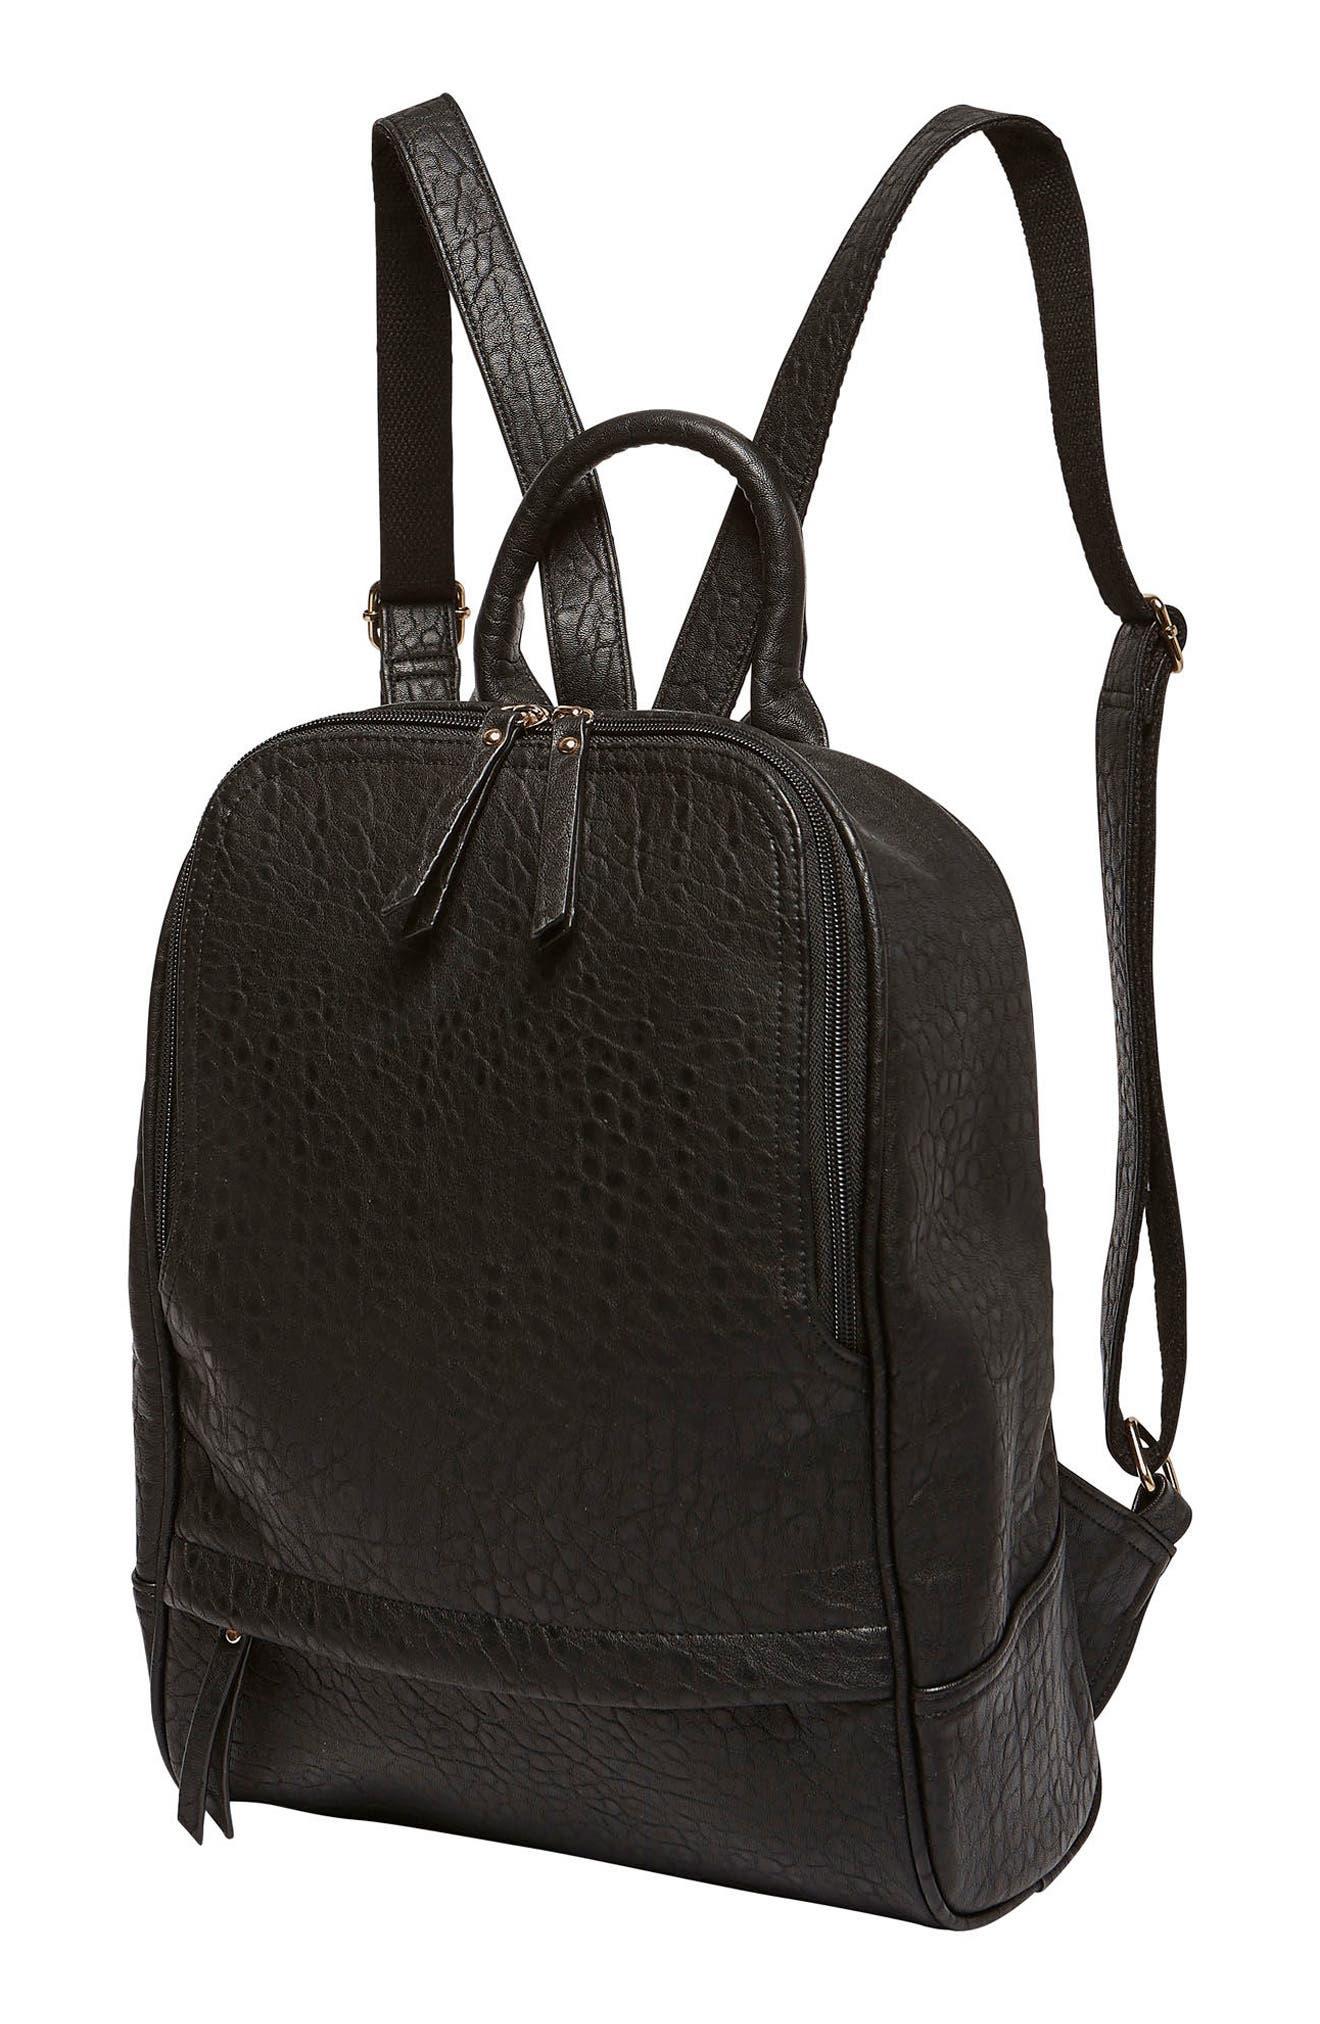 My Way Vegan Leather Backpack,                             Alternate thumbnail 4, color,                             BLACK